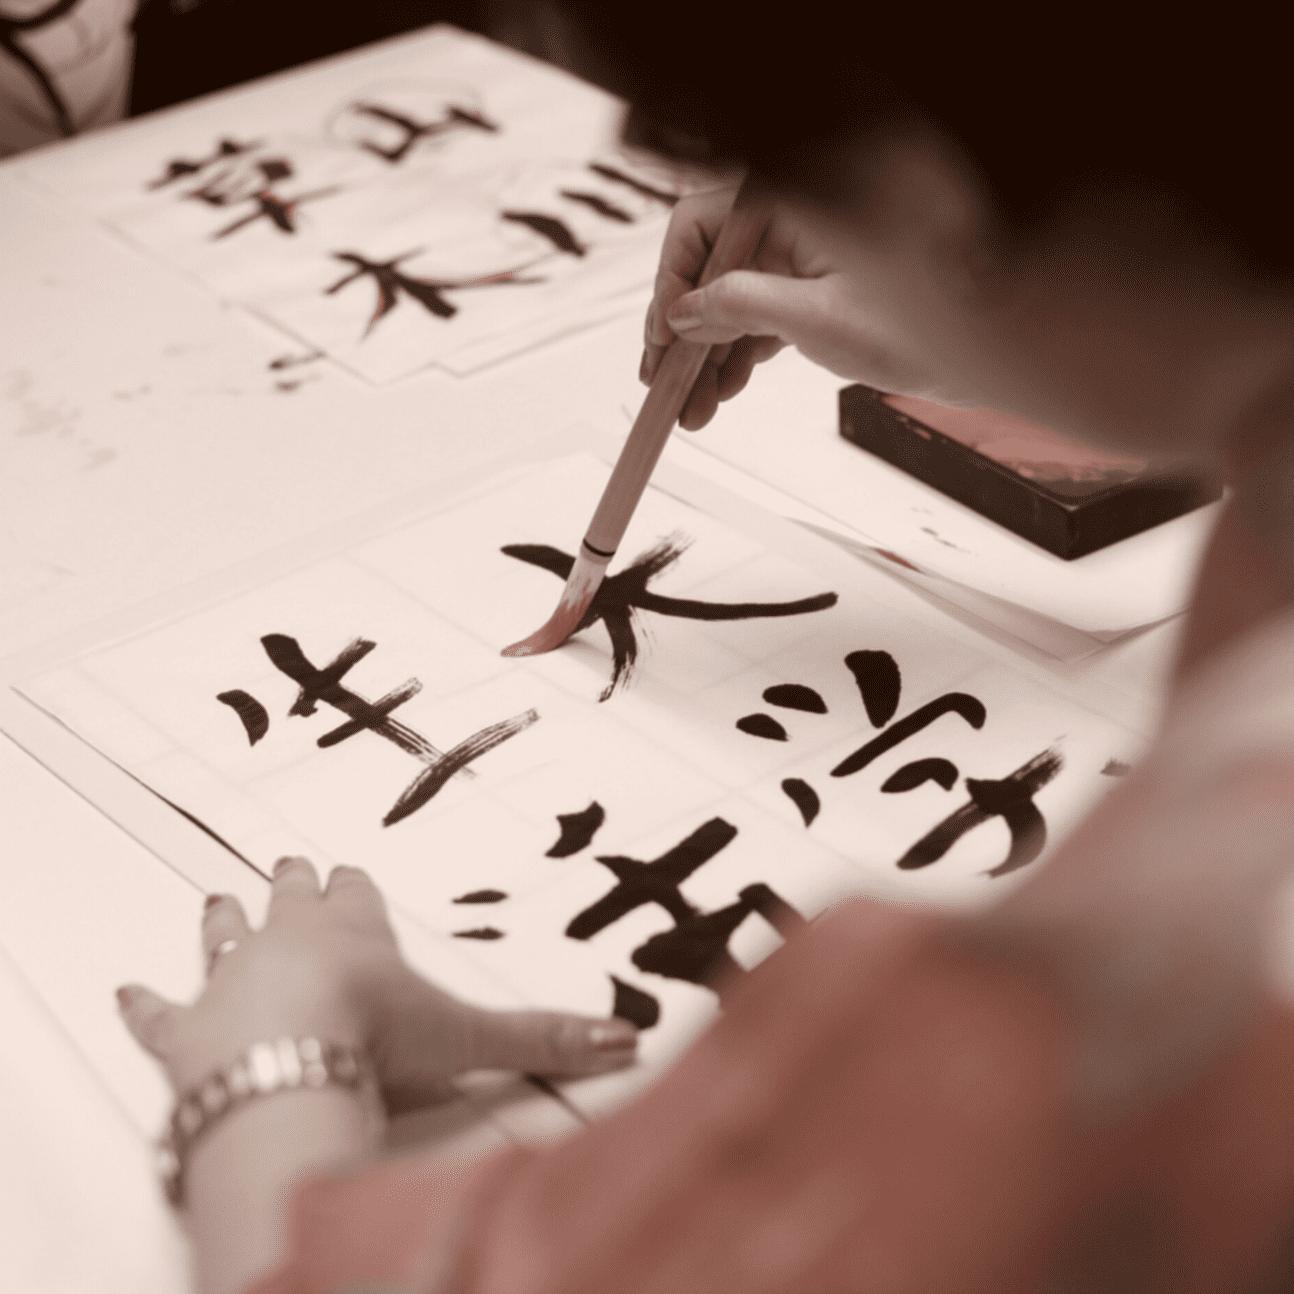 Tattoo giapponesi: simboli del linguaggio giapponese